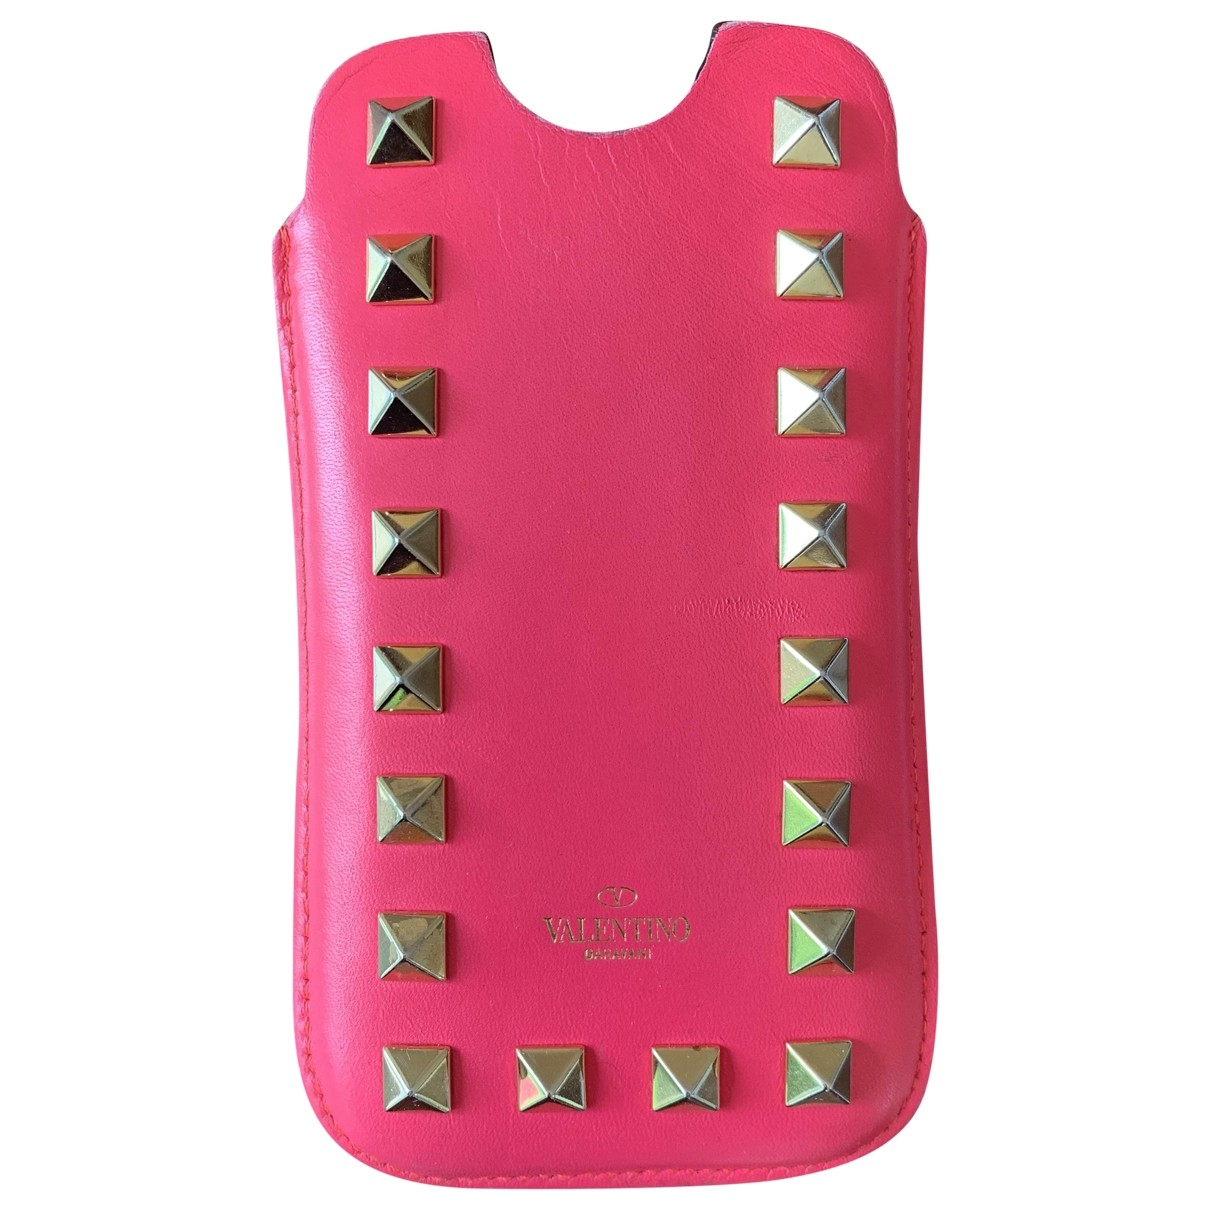 Valentino Garavani Guitar Rockstud Pink Leather Accessories for Life & Living \N